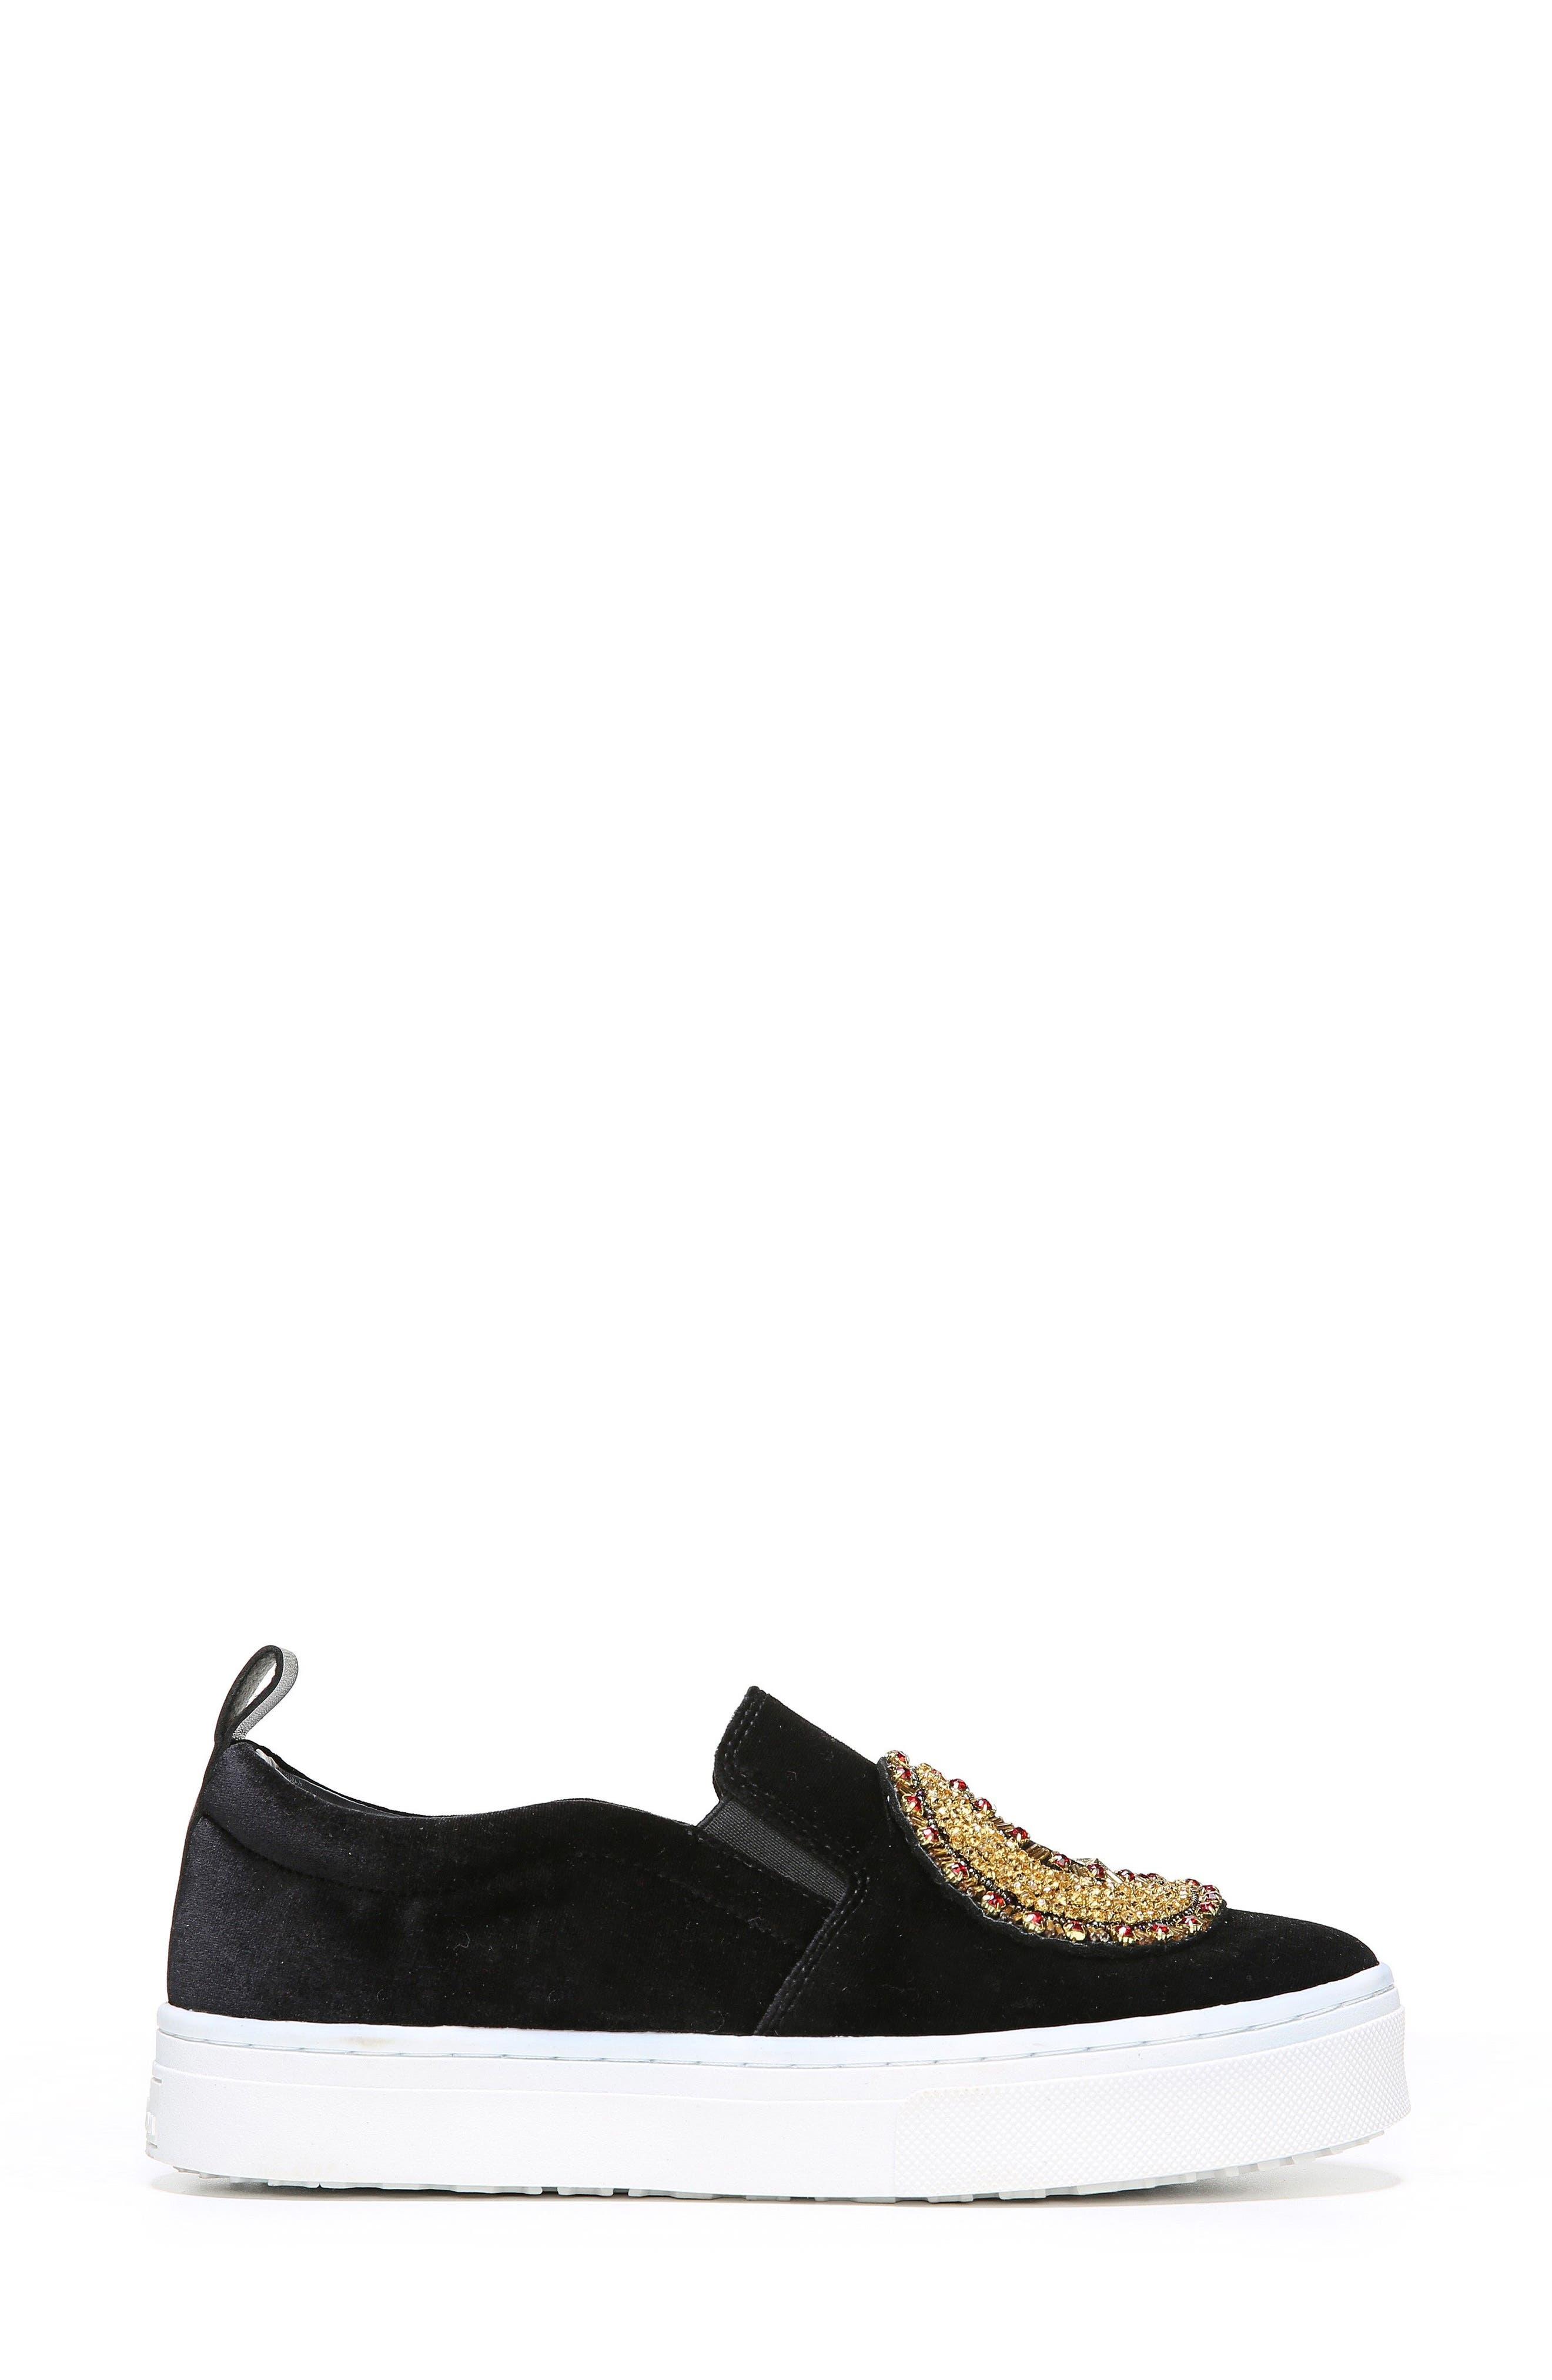 Alternate Image 3  - Sam Edelman Leila Embellished Platform Sneaker (Women)